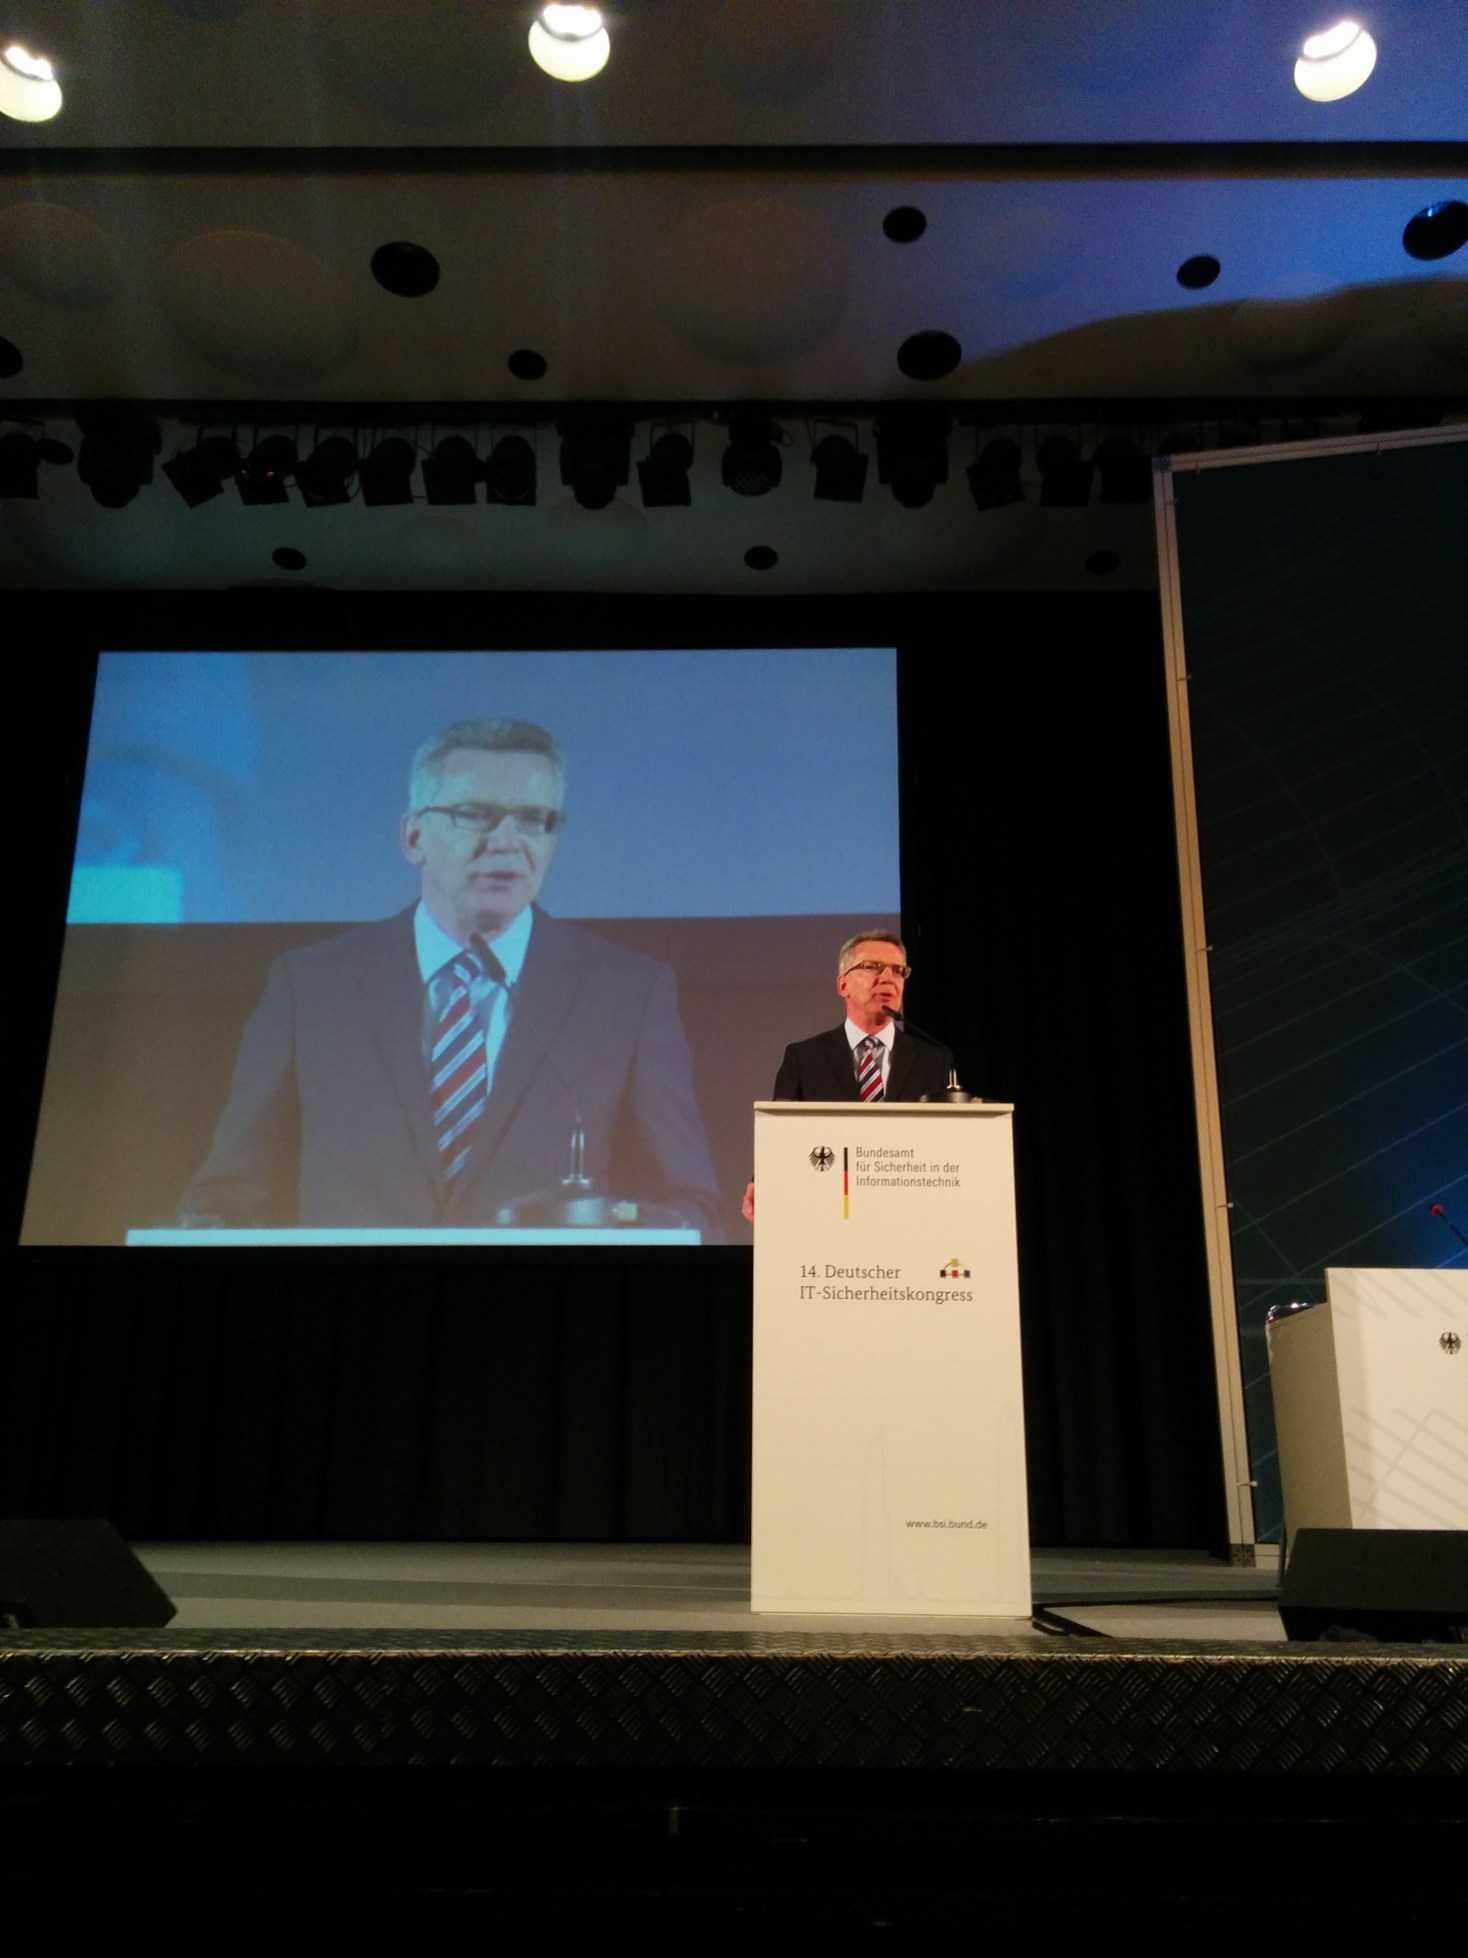 BSI-Kongress: de Maizière beklagt digitale Sorglosigkeit